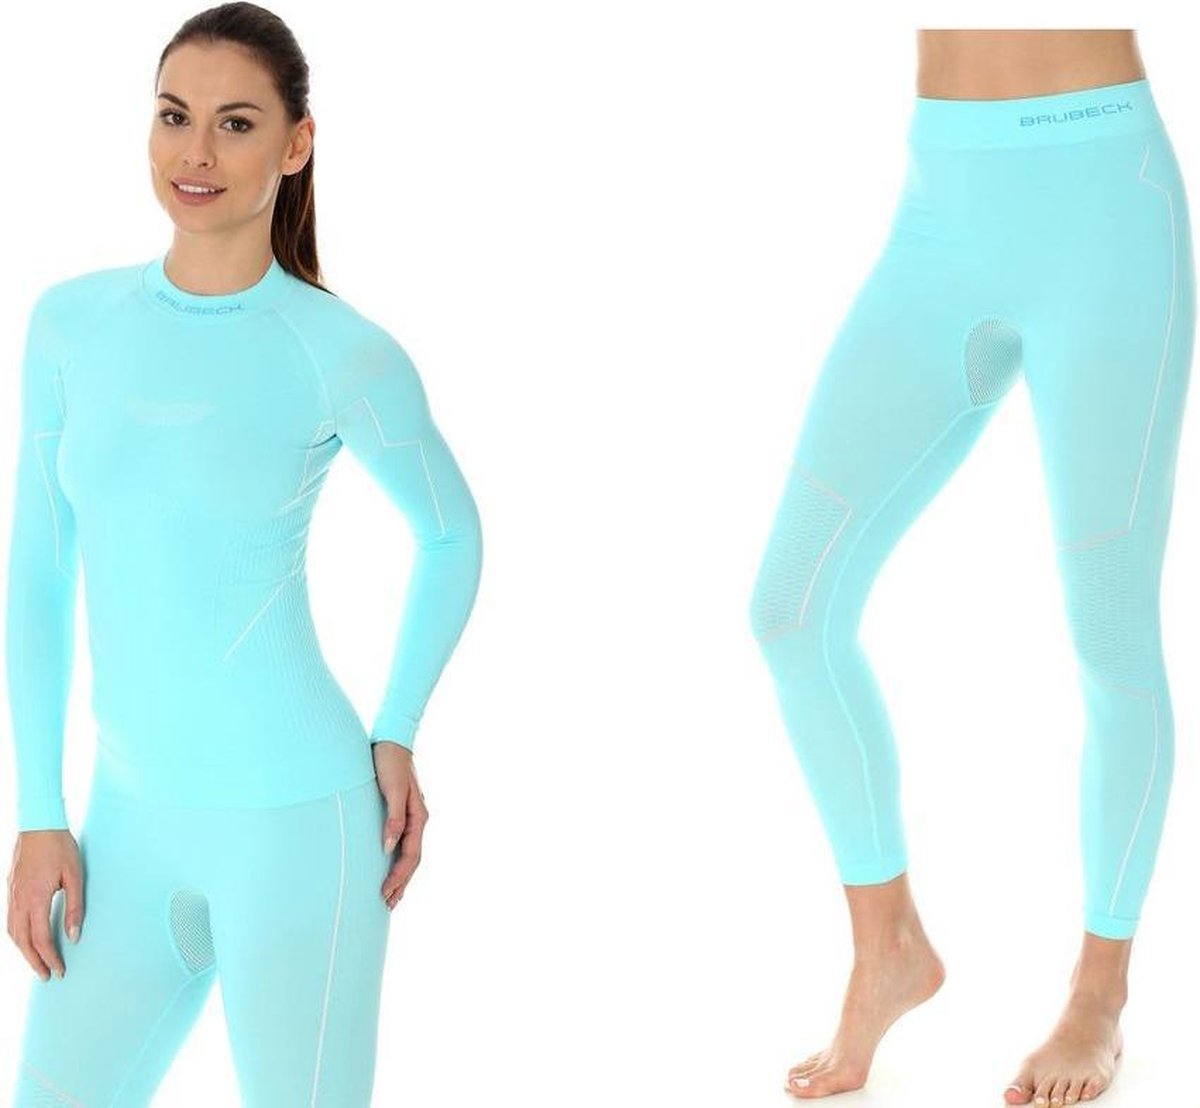 Brubeck | Dames Thermo Set - Thermokleding - met Nilit® Innergy - Lichtblauw - XL